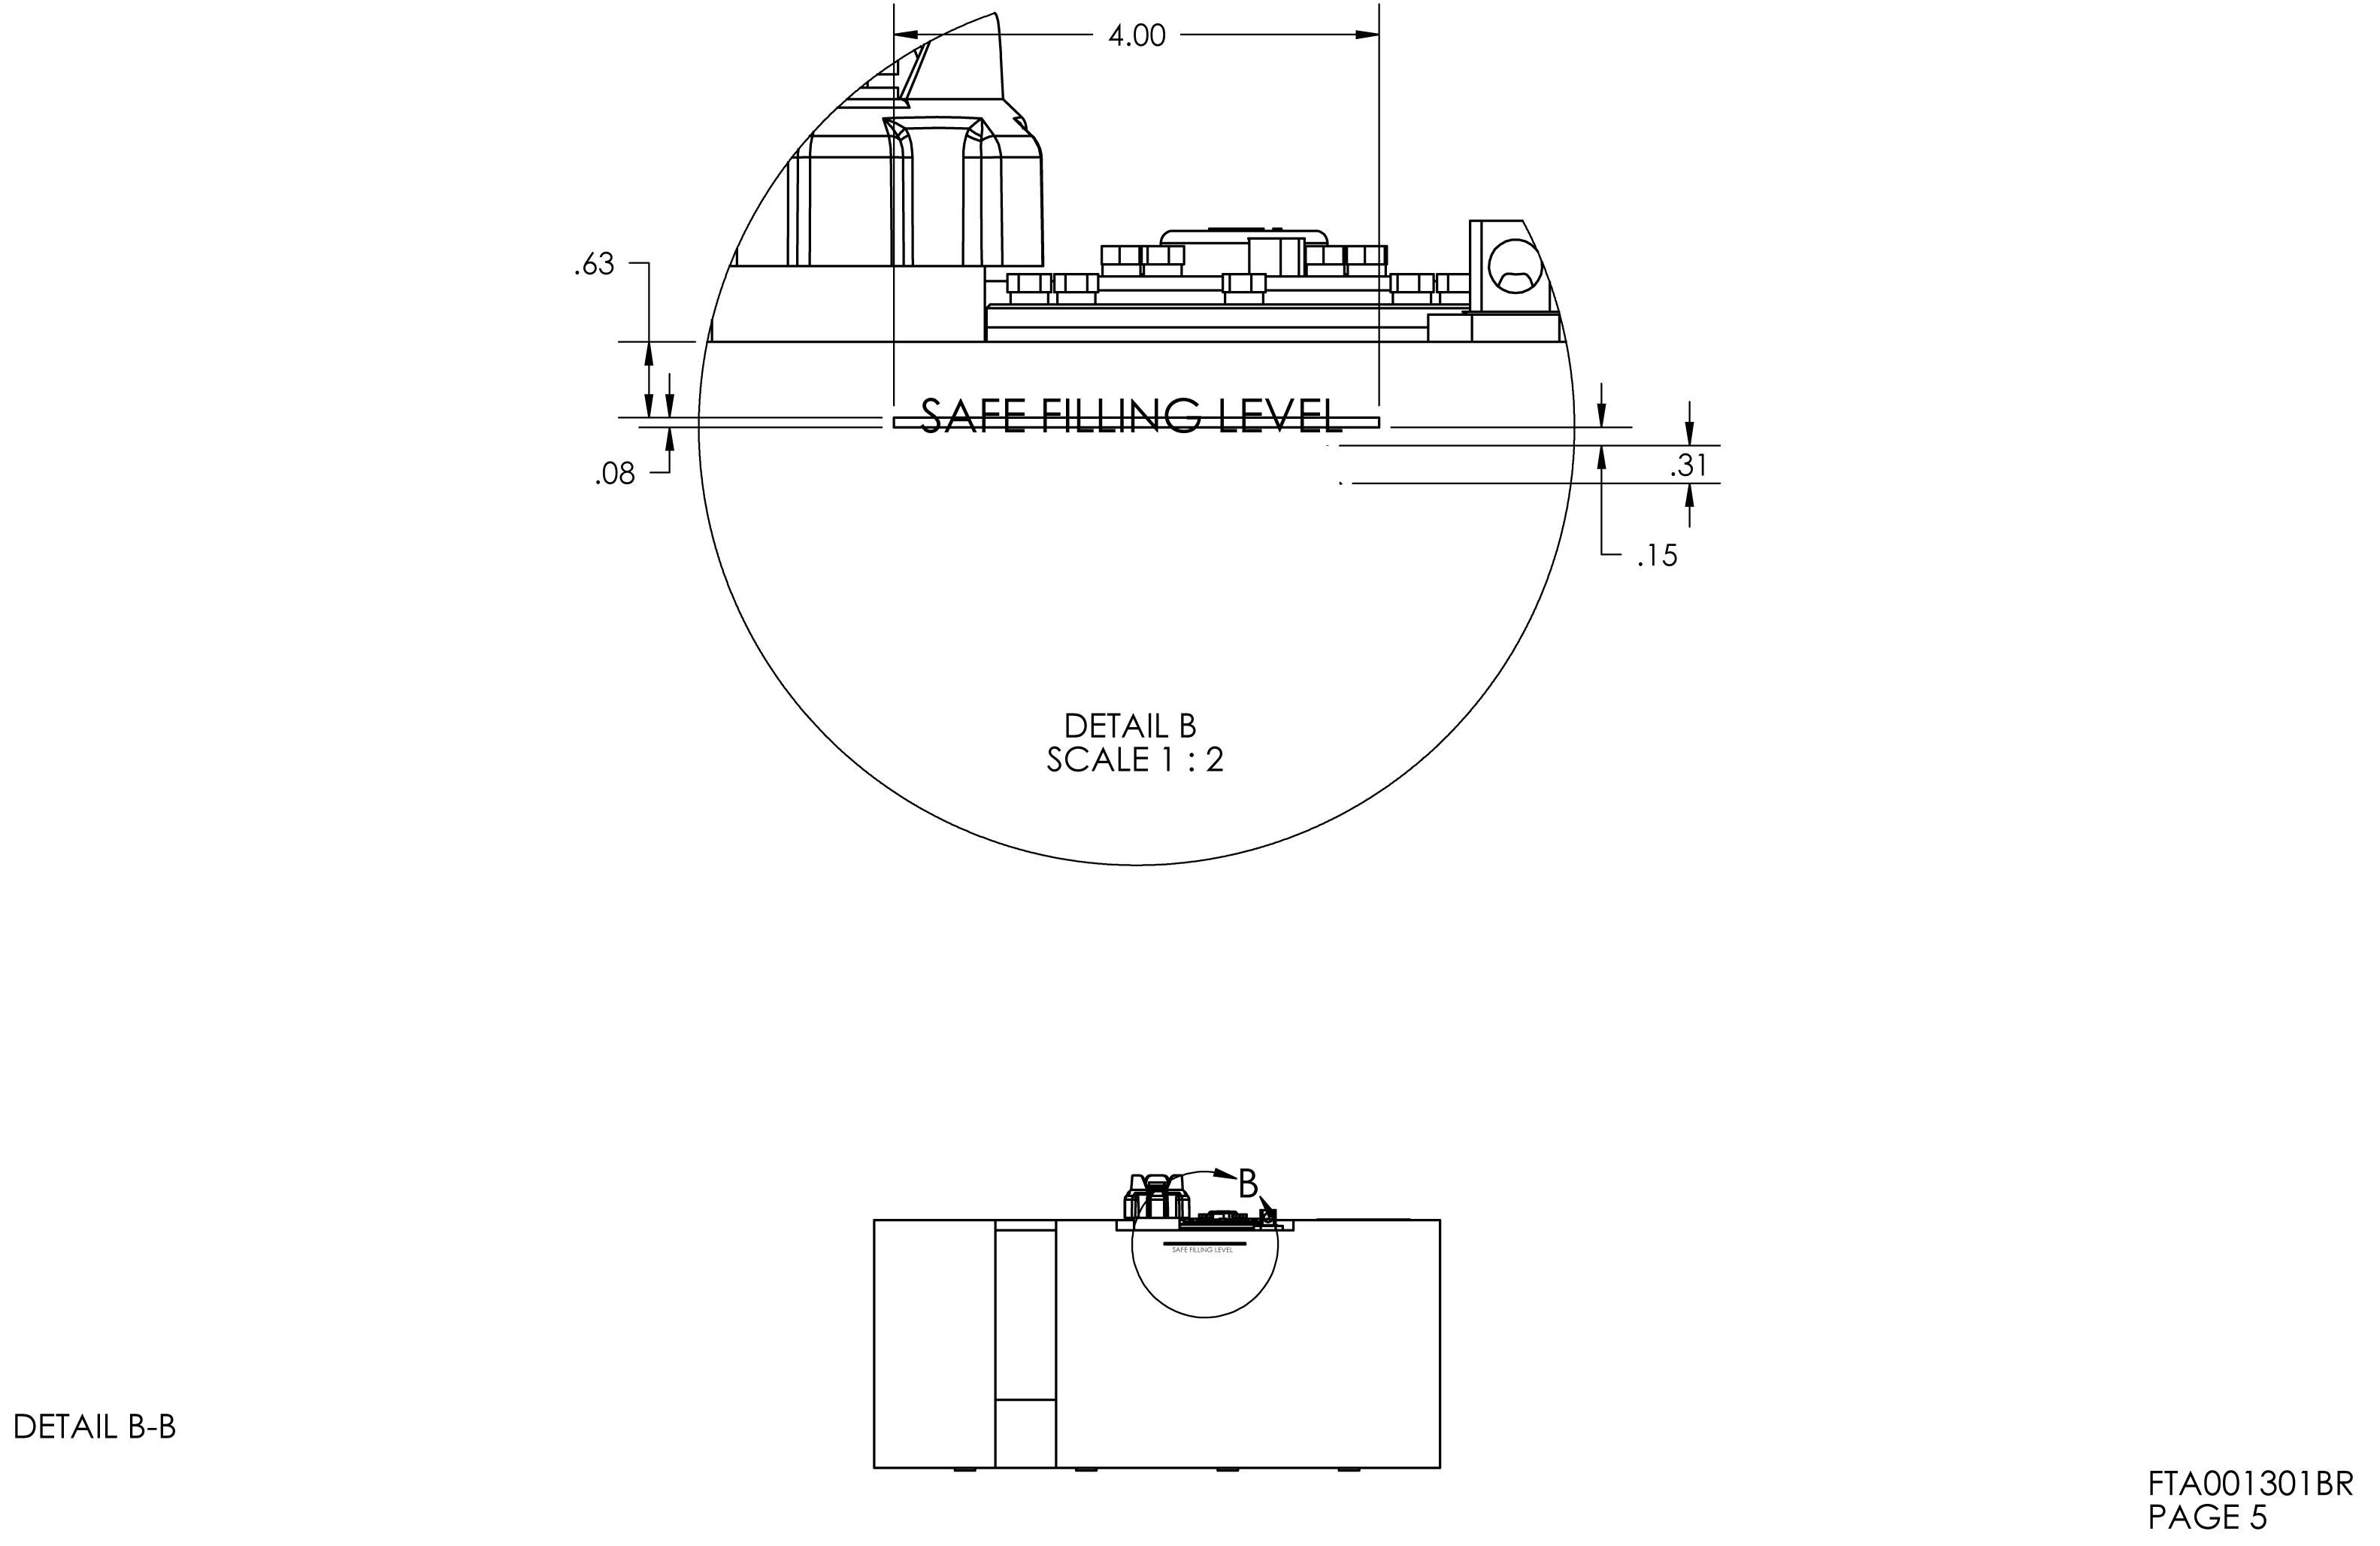 18 Gallon Rectangular Shaped Fuel Tank 28 X 15 X 12 25